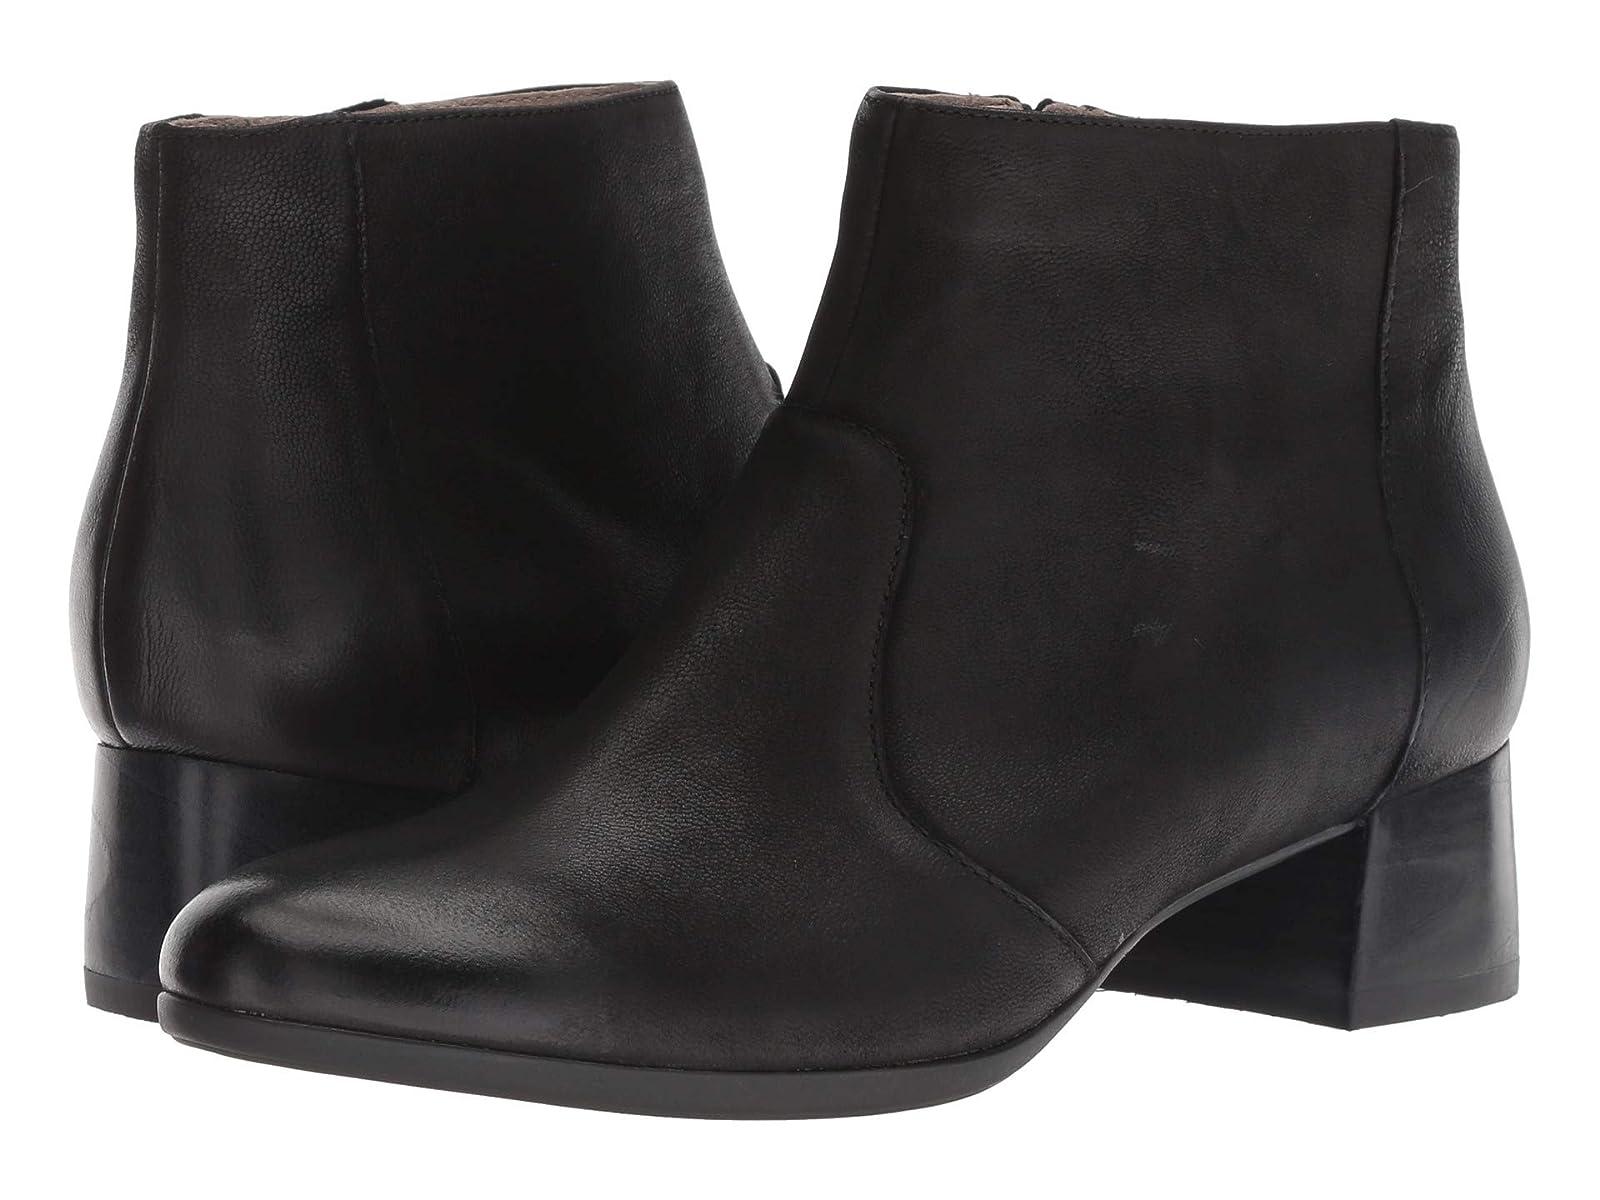 Dansko PetraAffordable and distinctive shoes